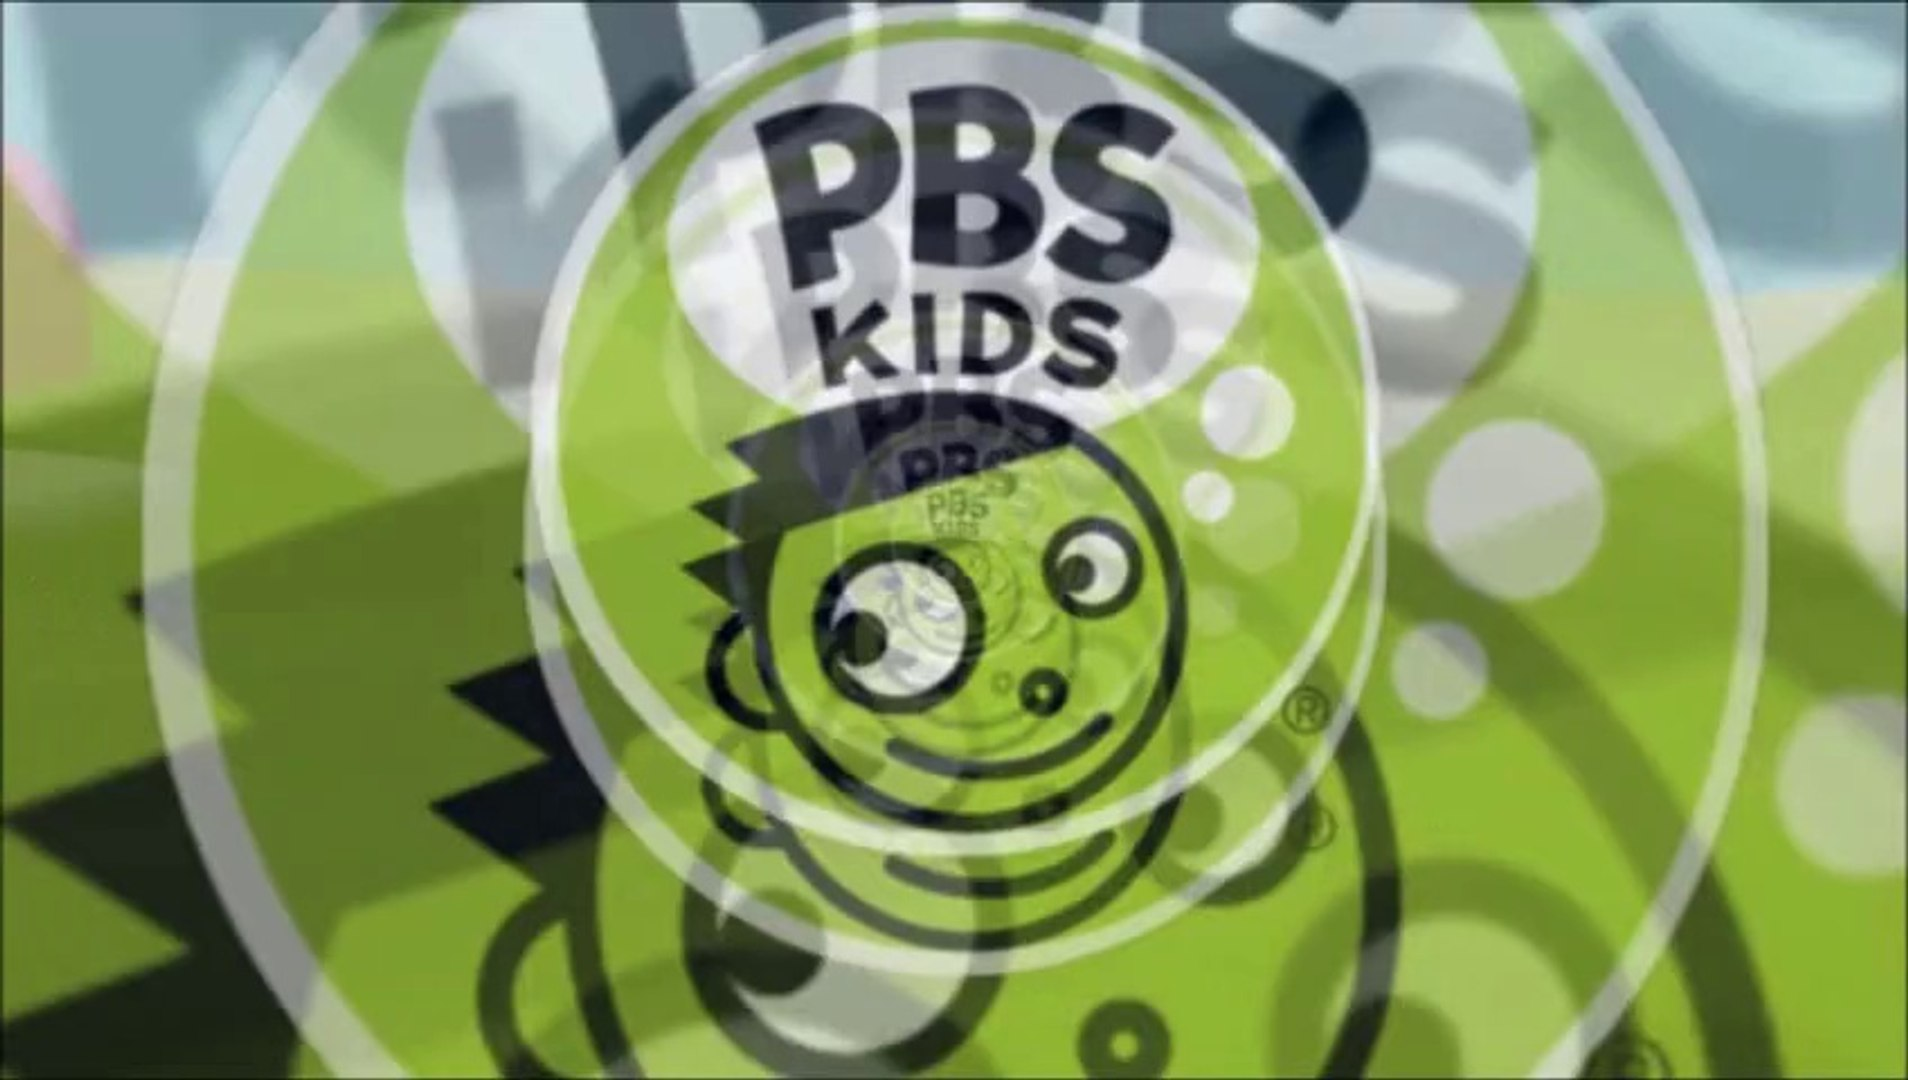 PBS KIDS Studios Home Entertainment & VCD Karaoke Intro (2014)